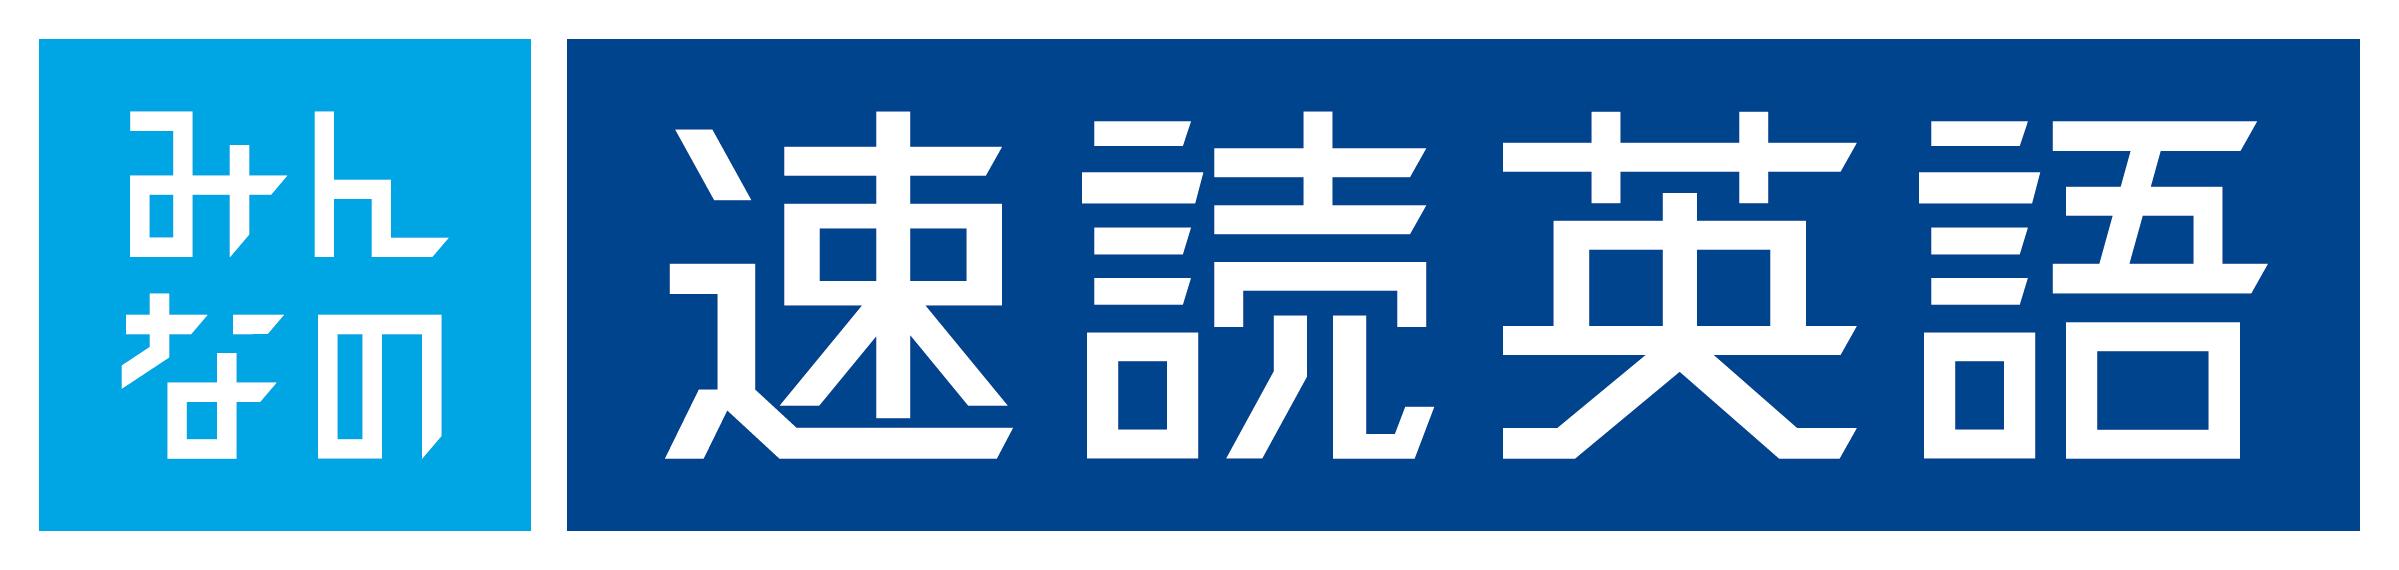 minsokuei_logo-01